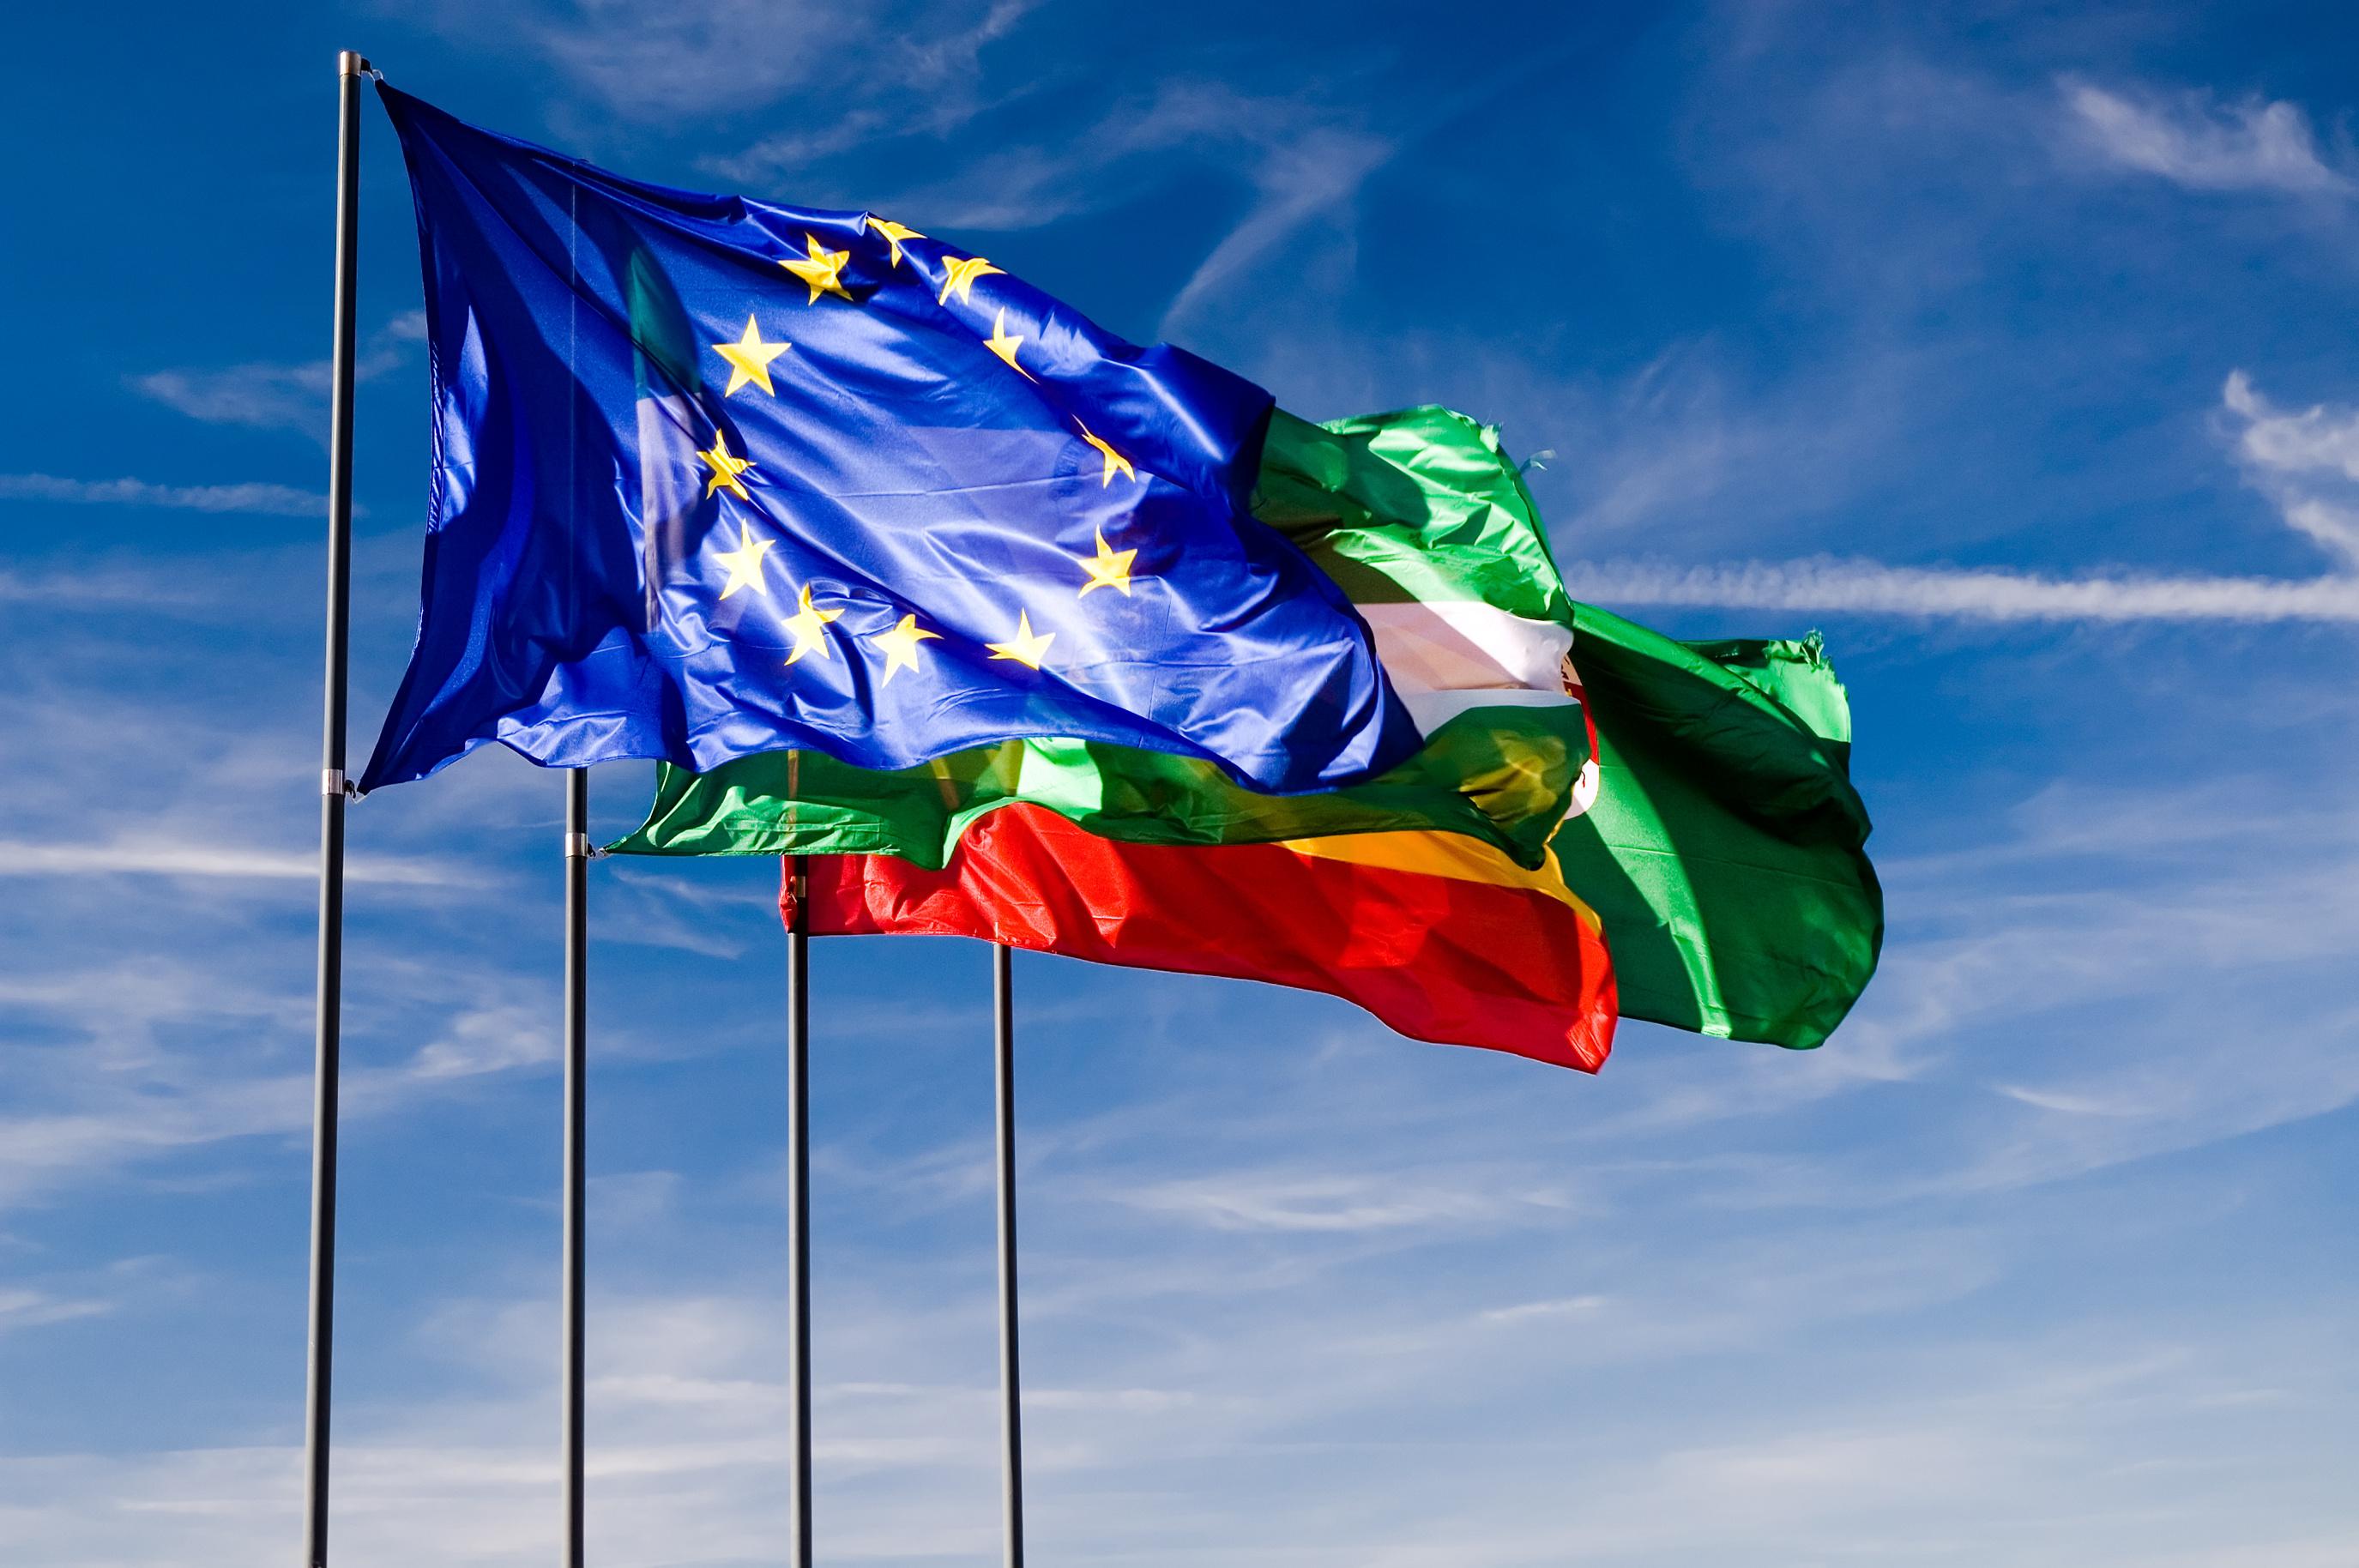 European flag against blue sky